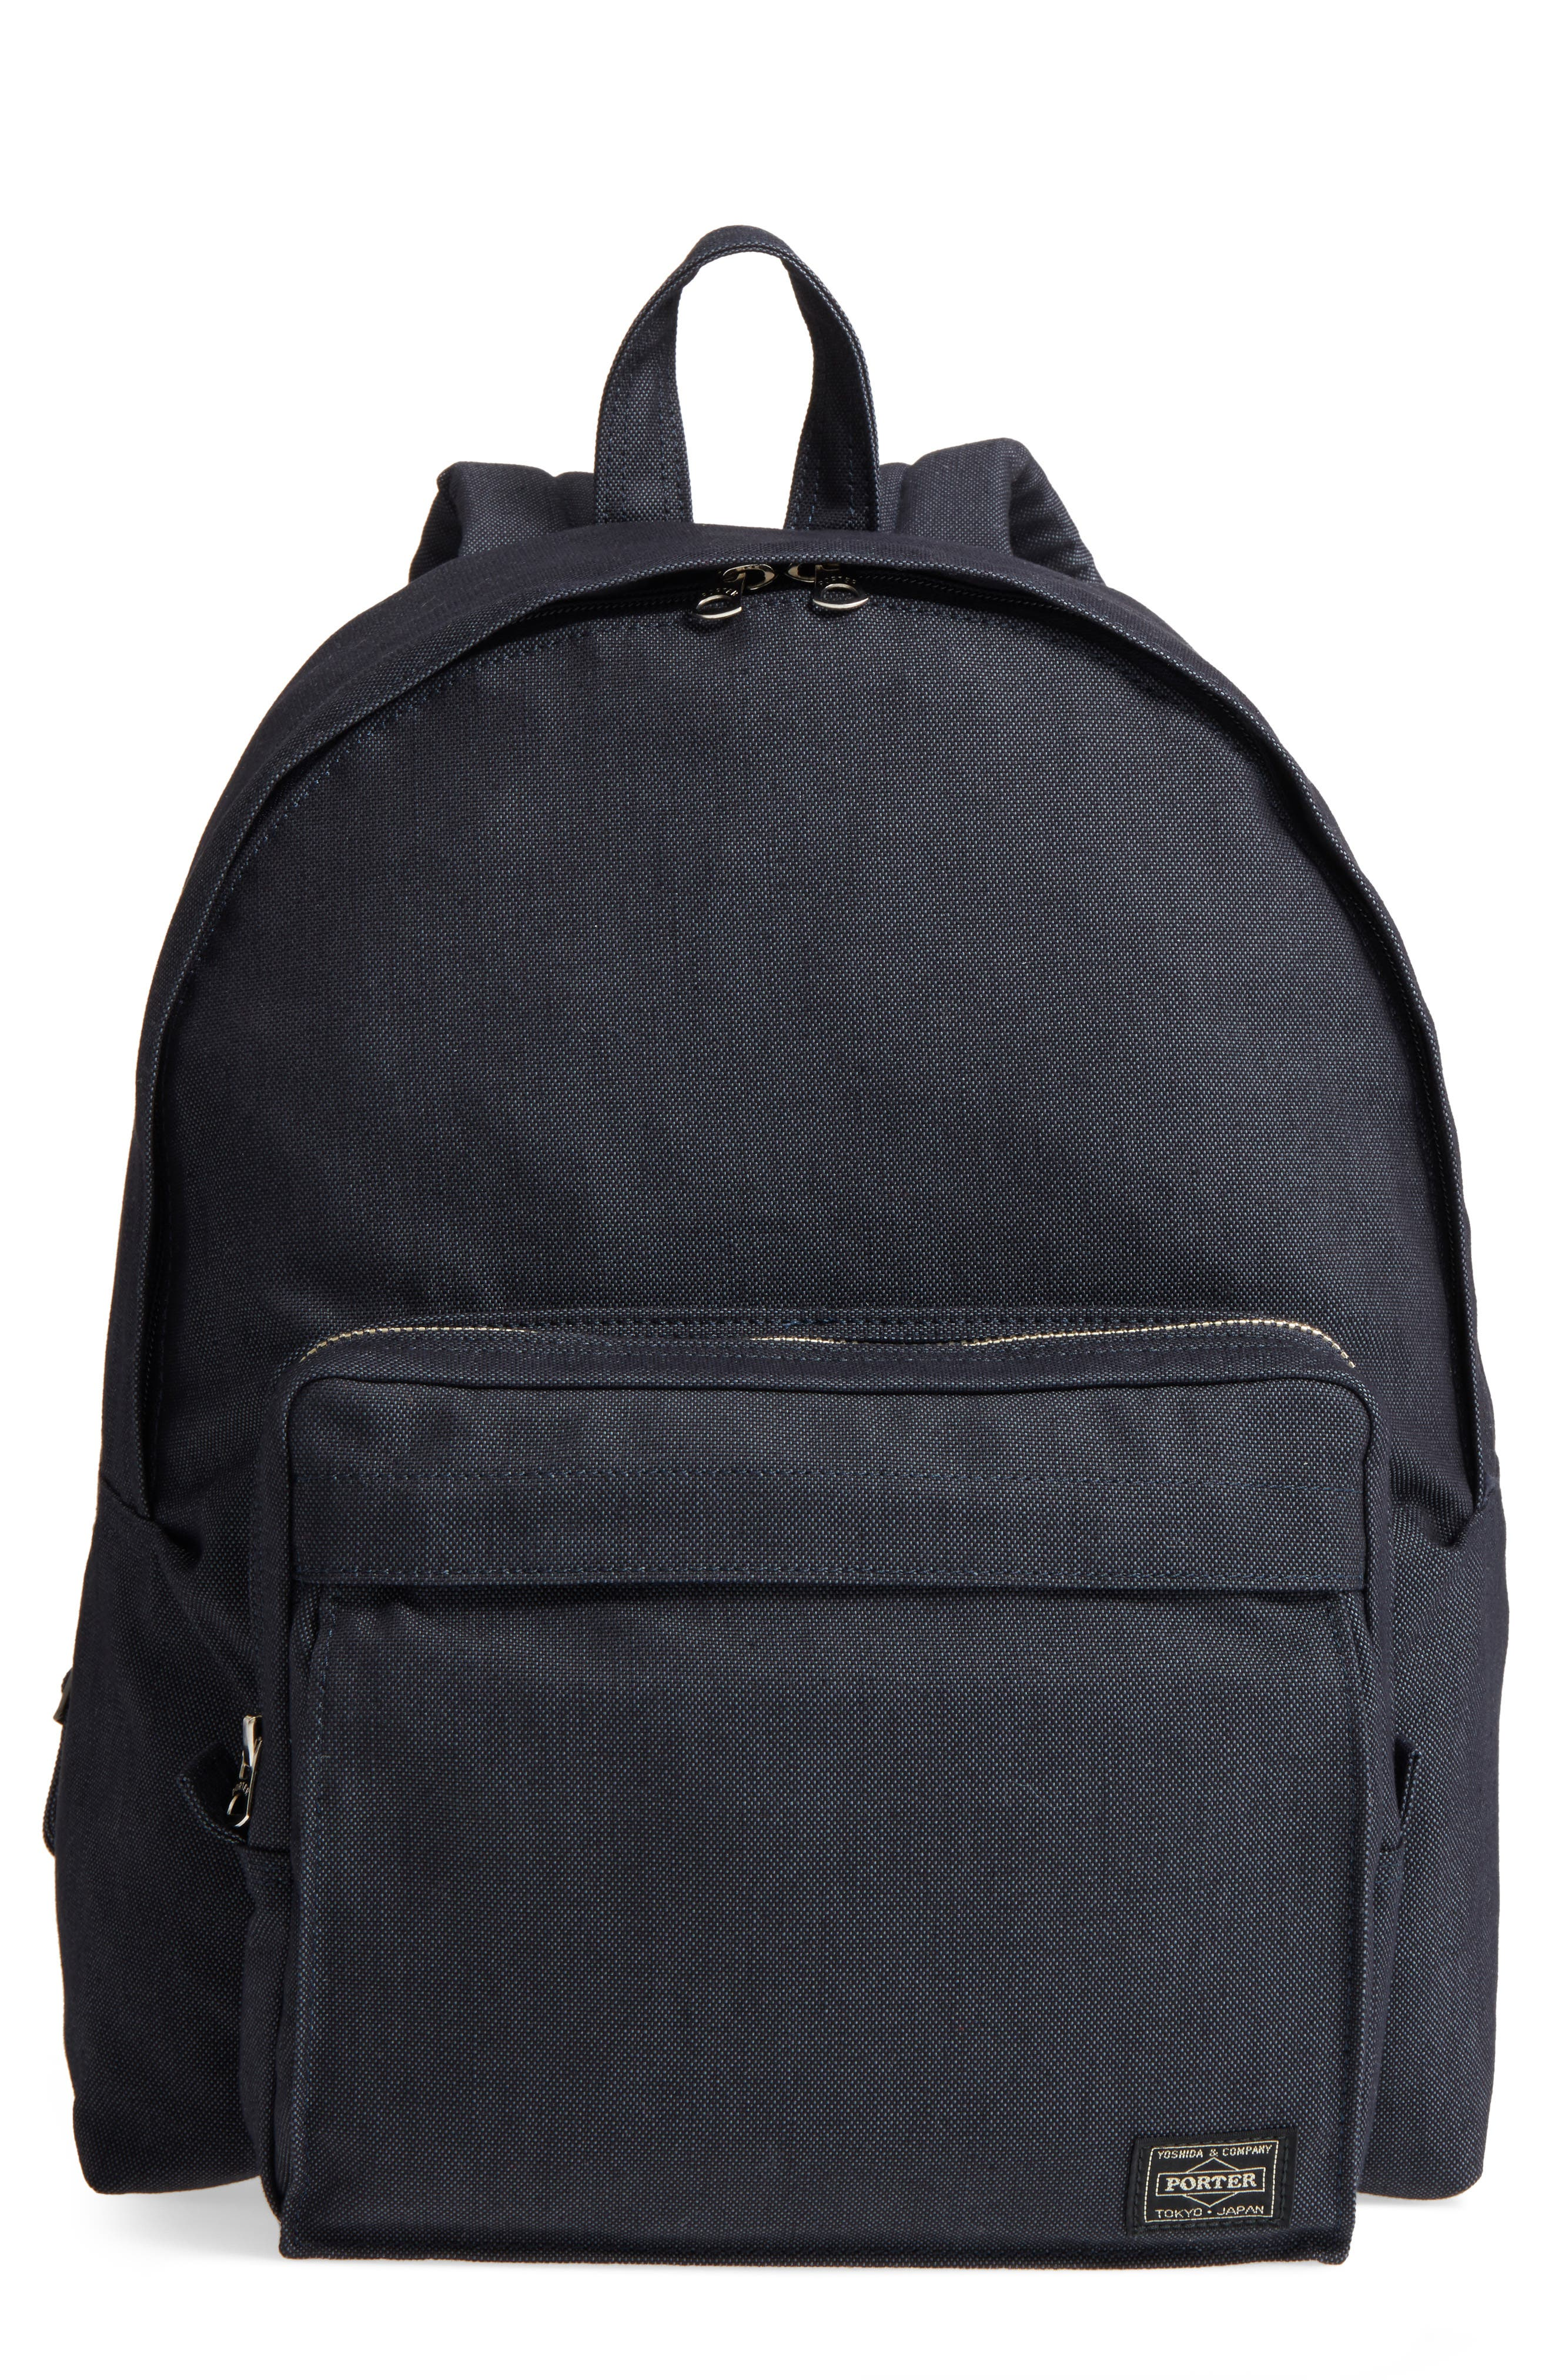 Main Image - Porter-Yoshida & Co. Smoky Backpack